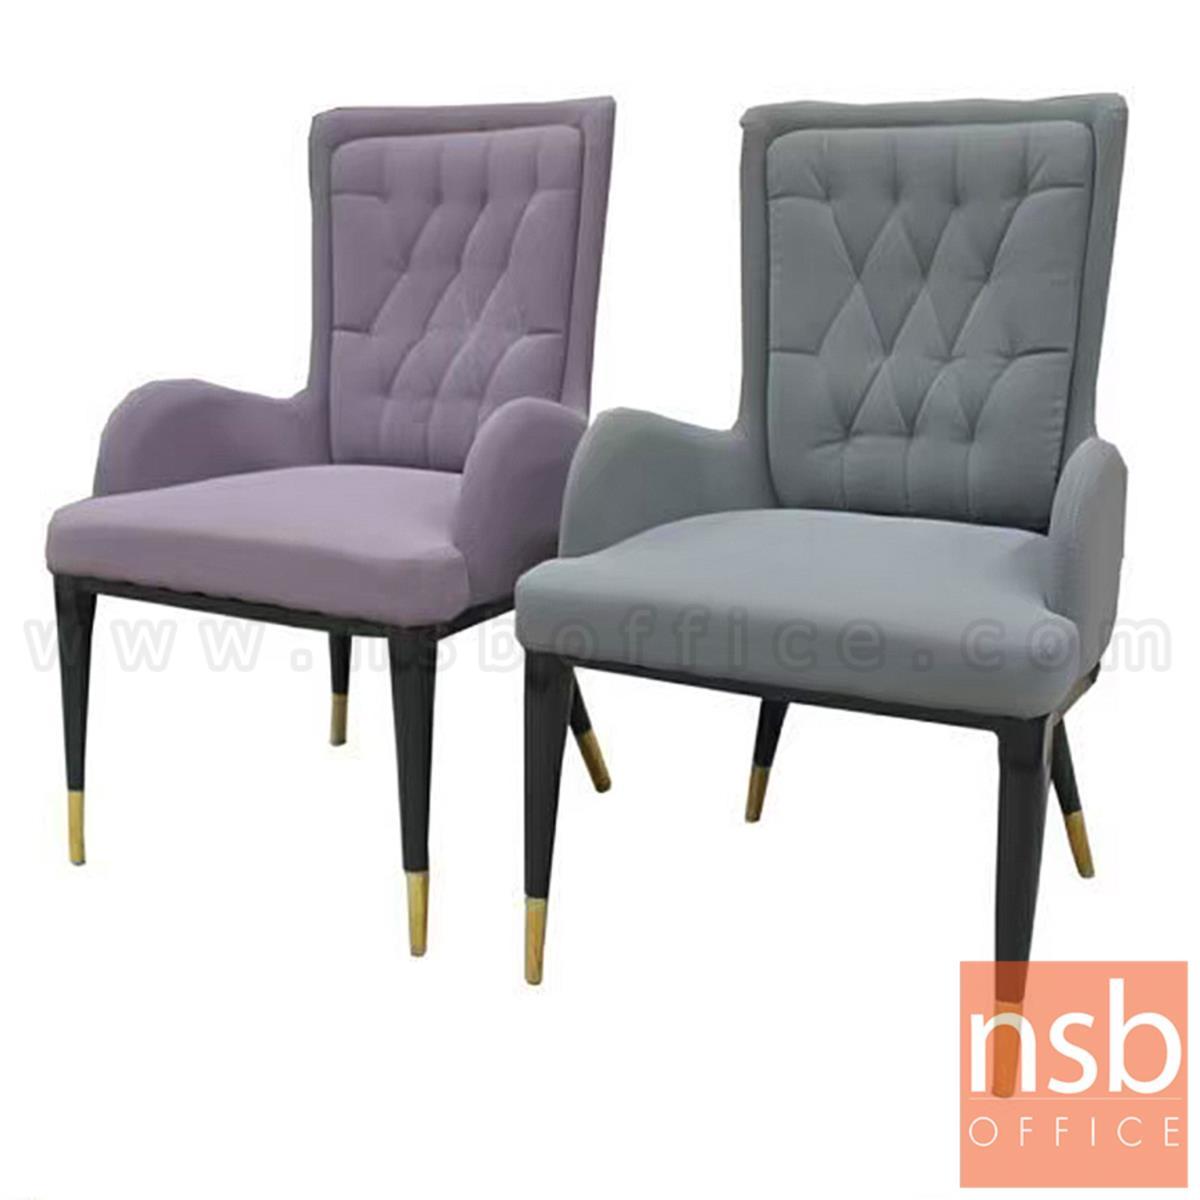 B29A373:เก้าอี้โมเดิร์นหุ้มผ้า รุ่น Arknight (อาร์คไนท์)  ขาเหล็ก